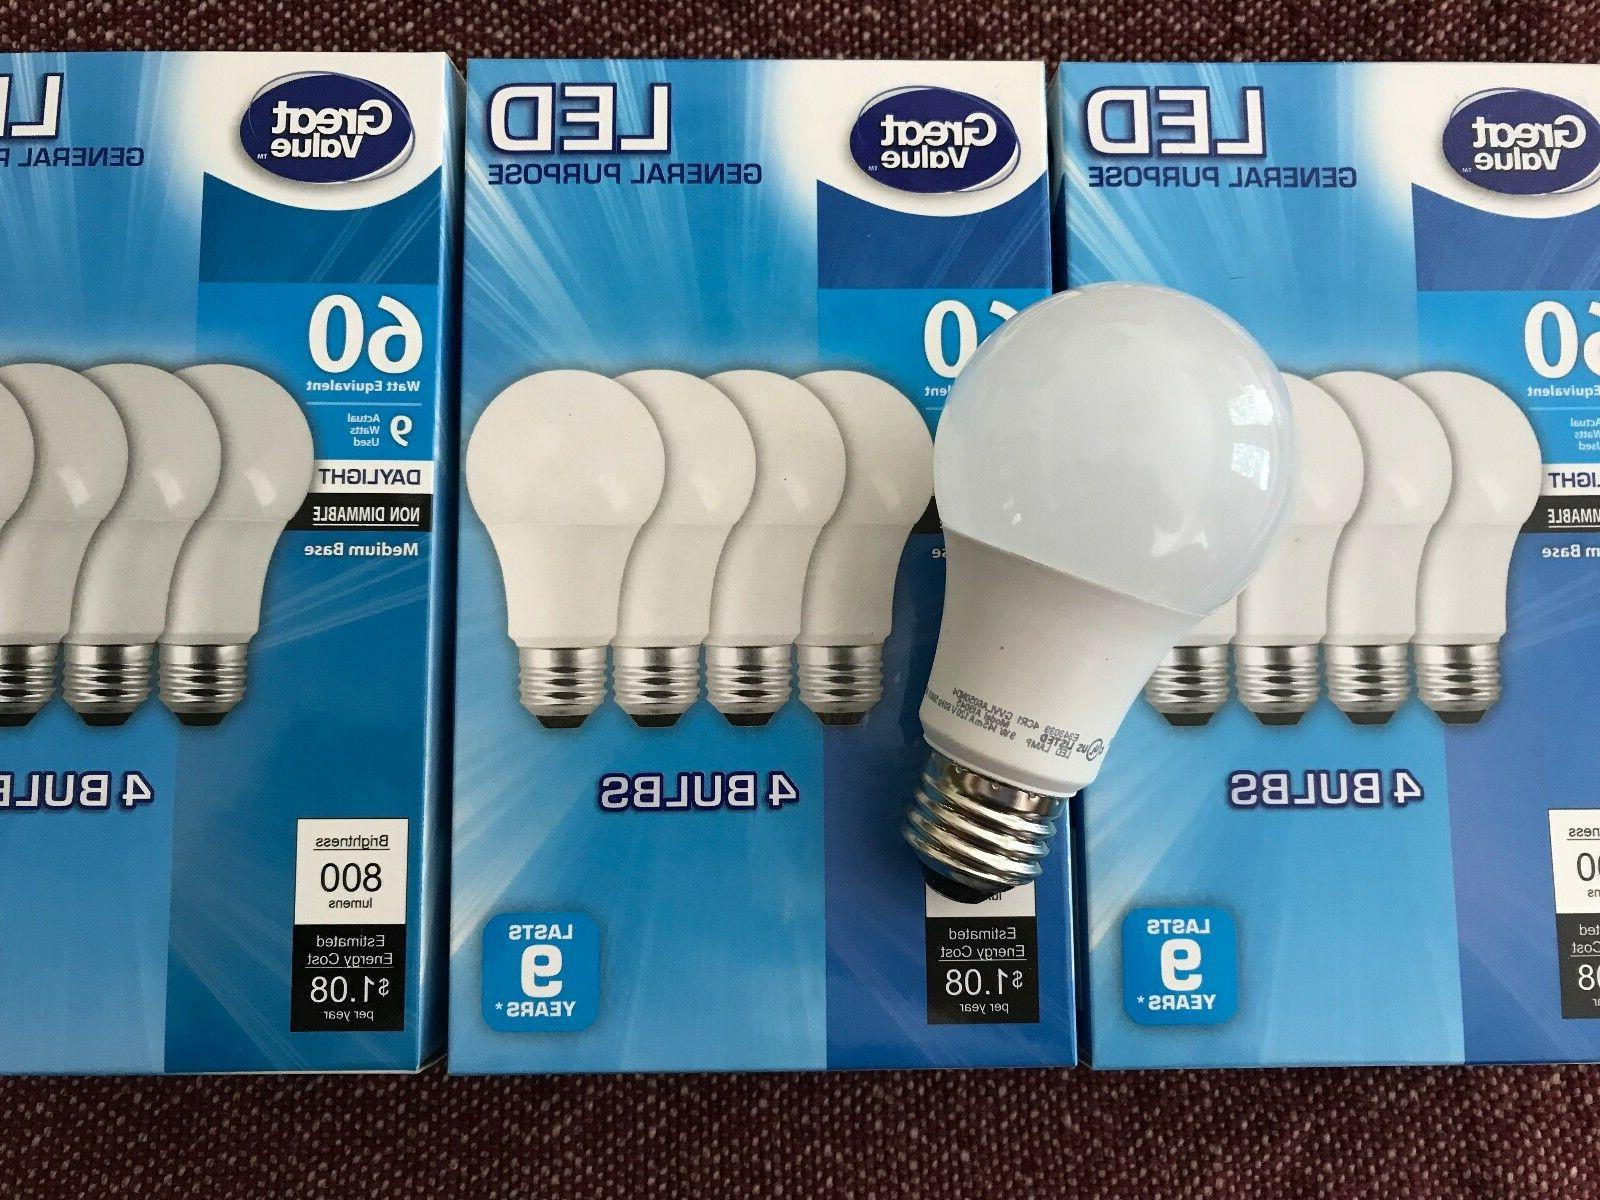 12 LED 60W = Watt E26 light